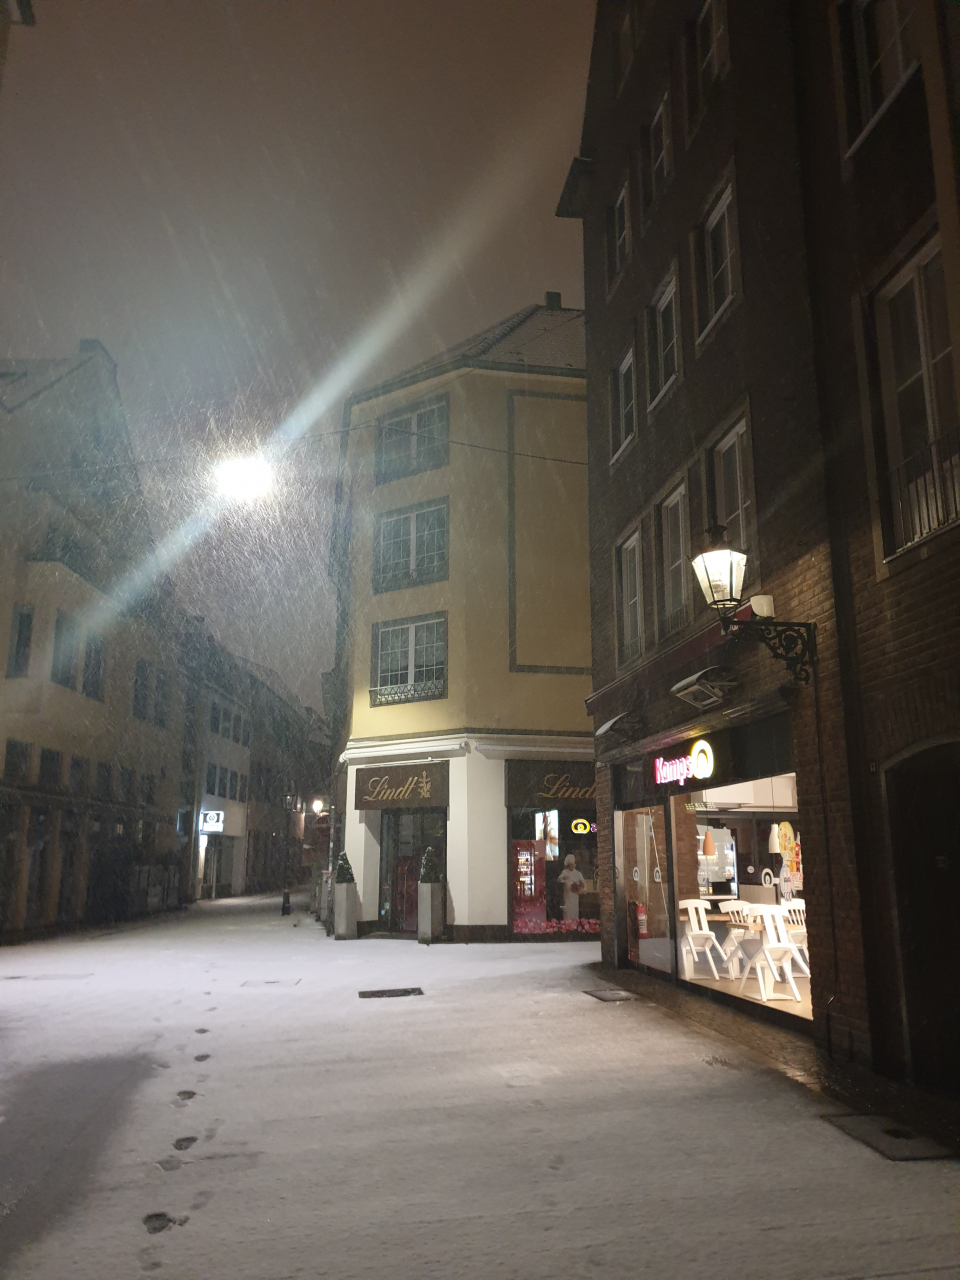 Finally some snow!! (5:00 am)